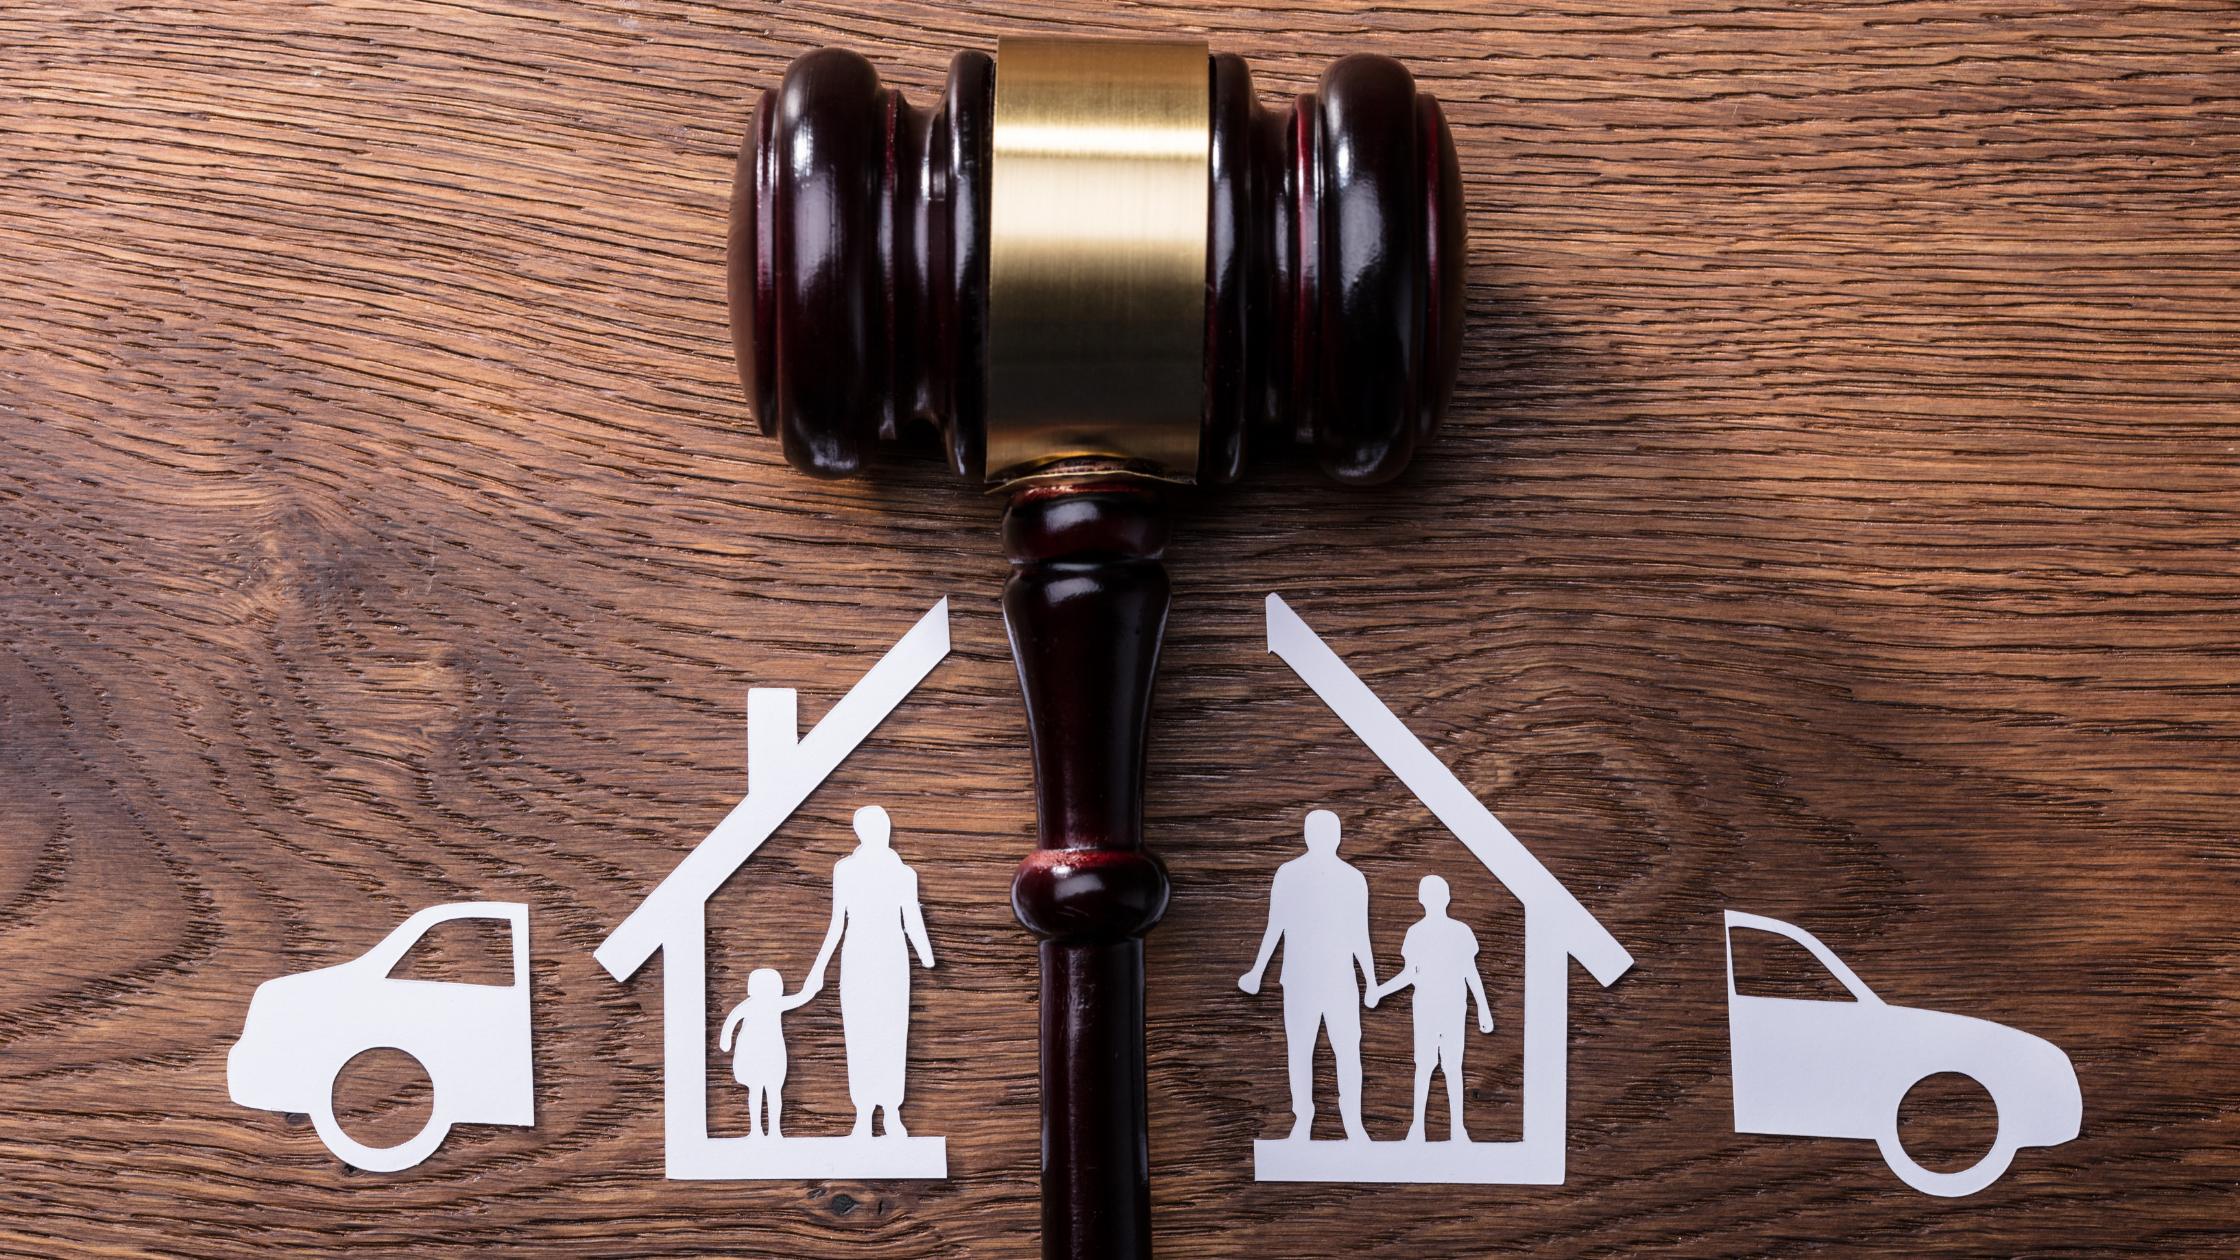 gavel and family split by divorce